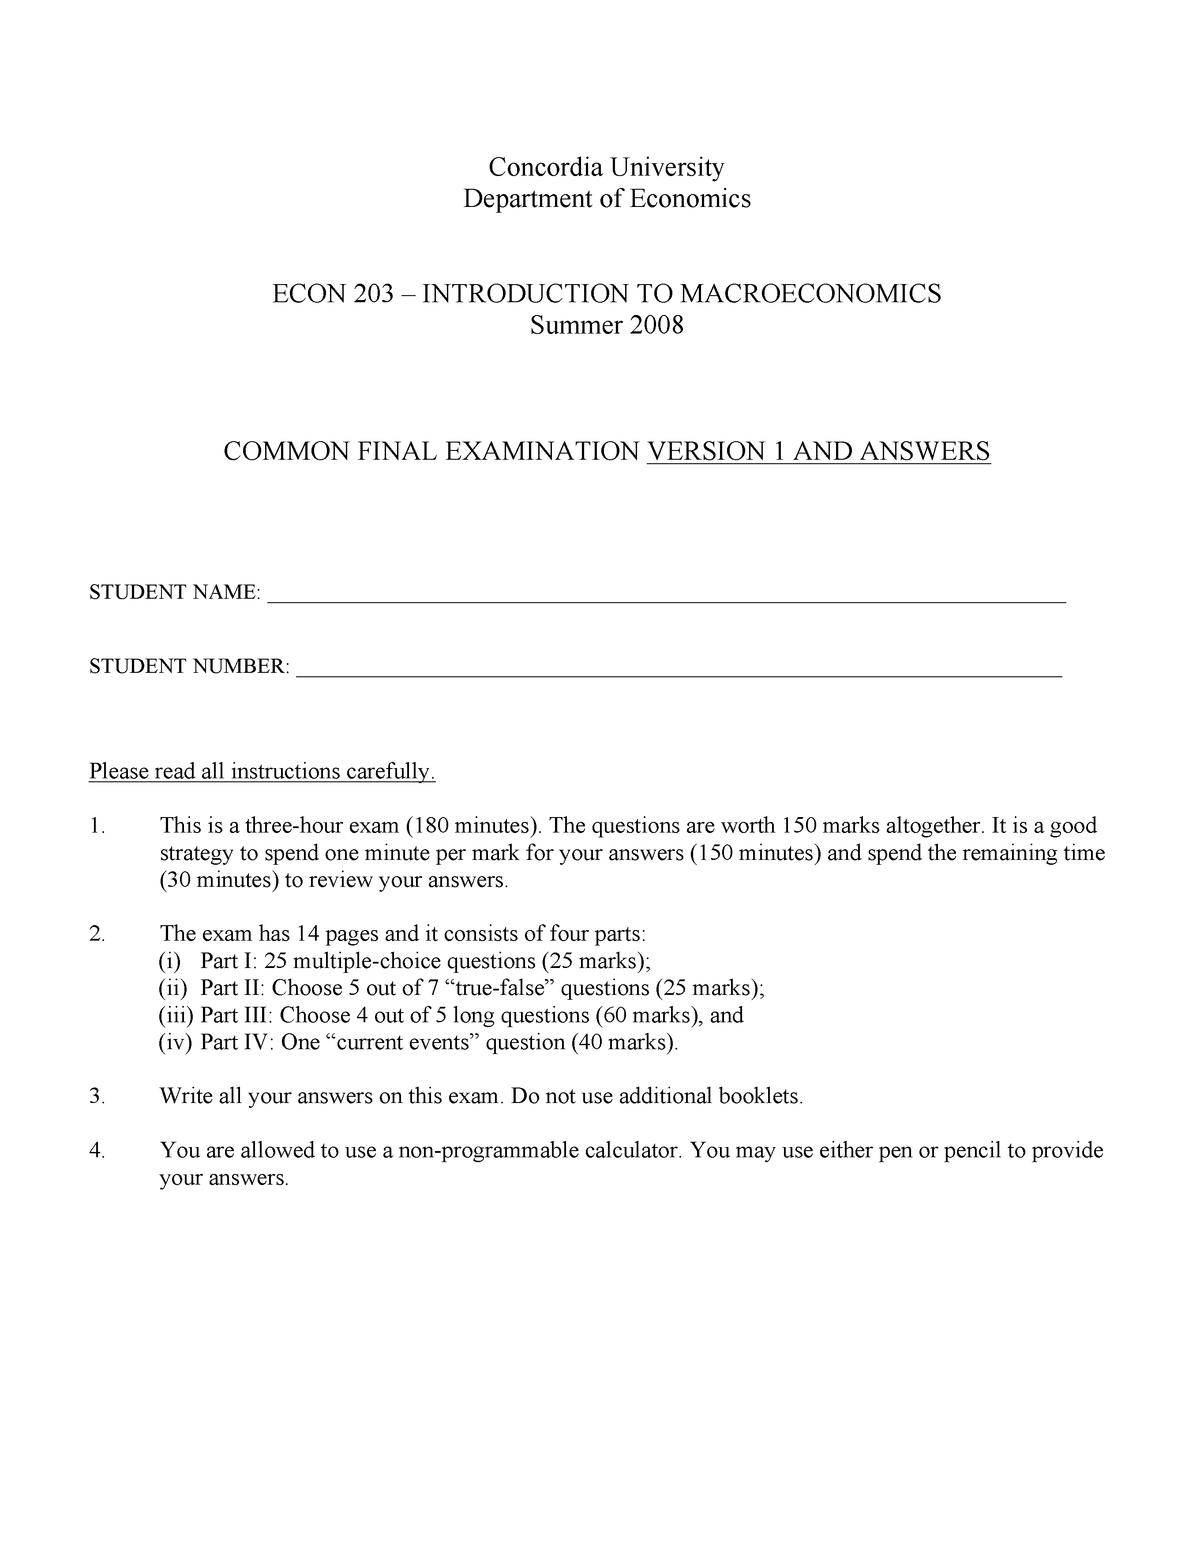 Exam 2014, questions - ECON 203 - Concordia - StuDocu